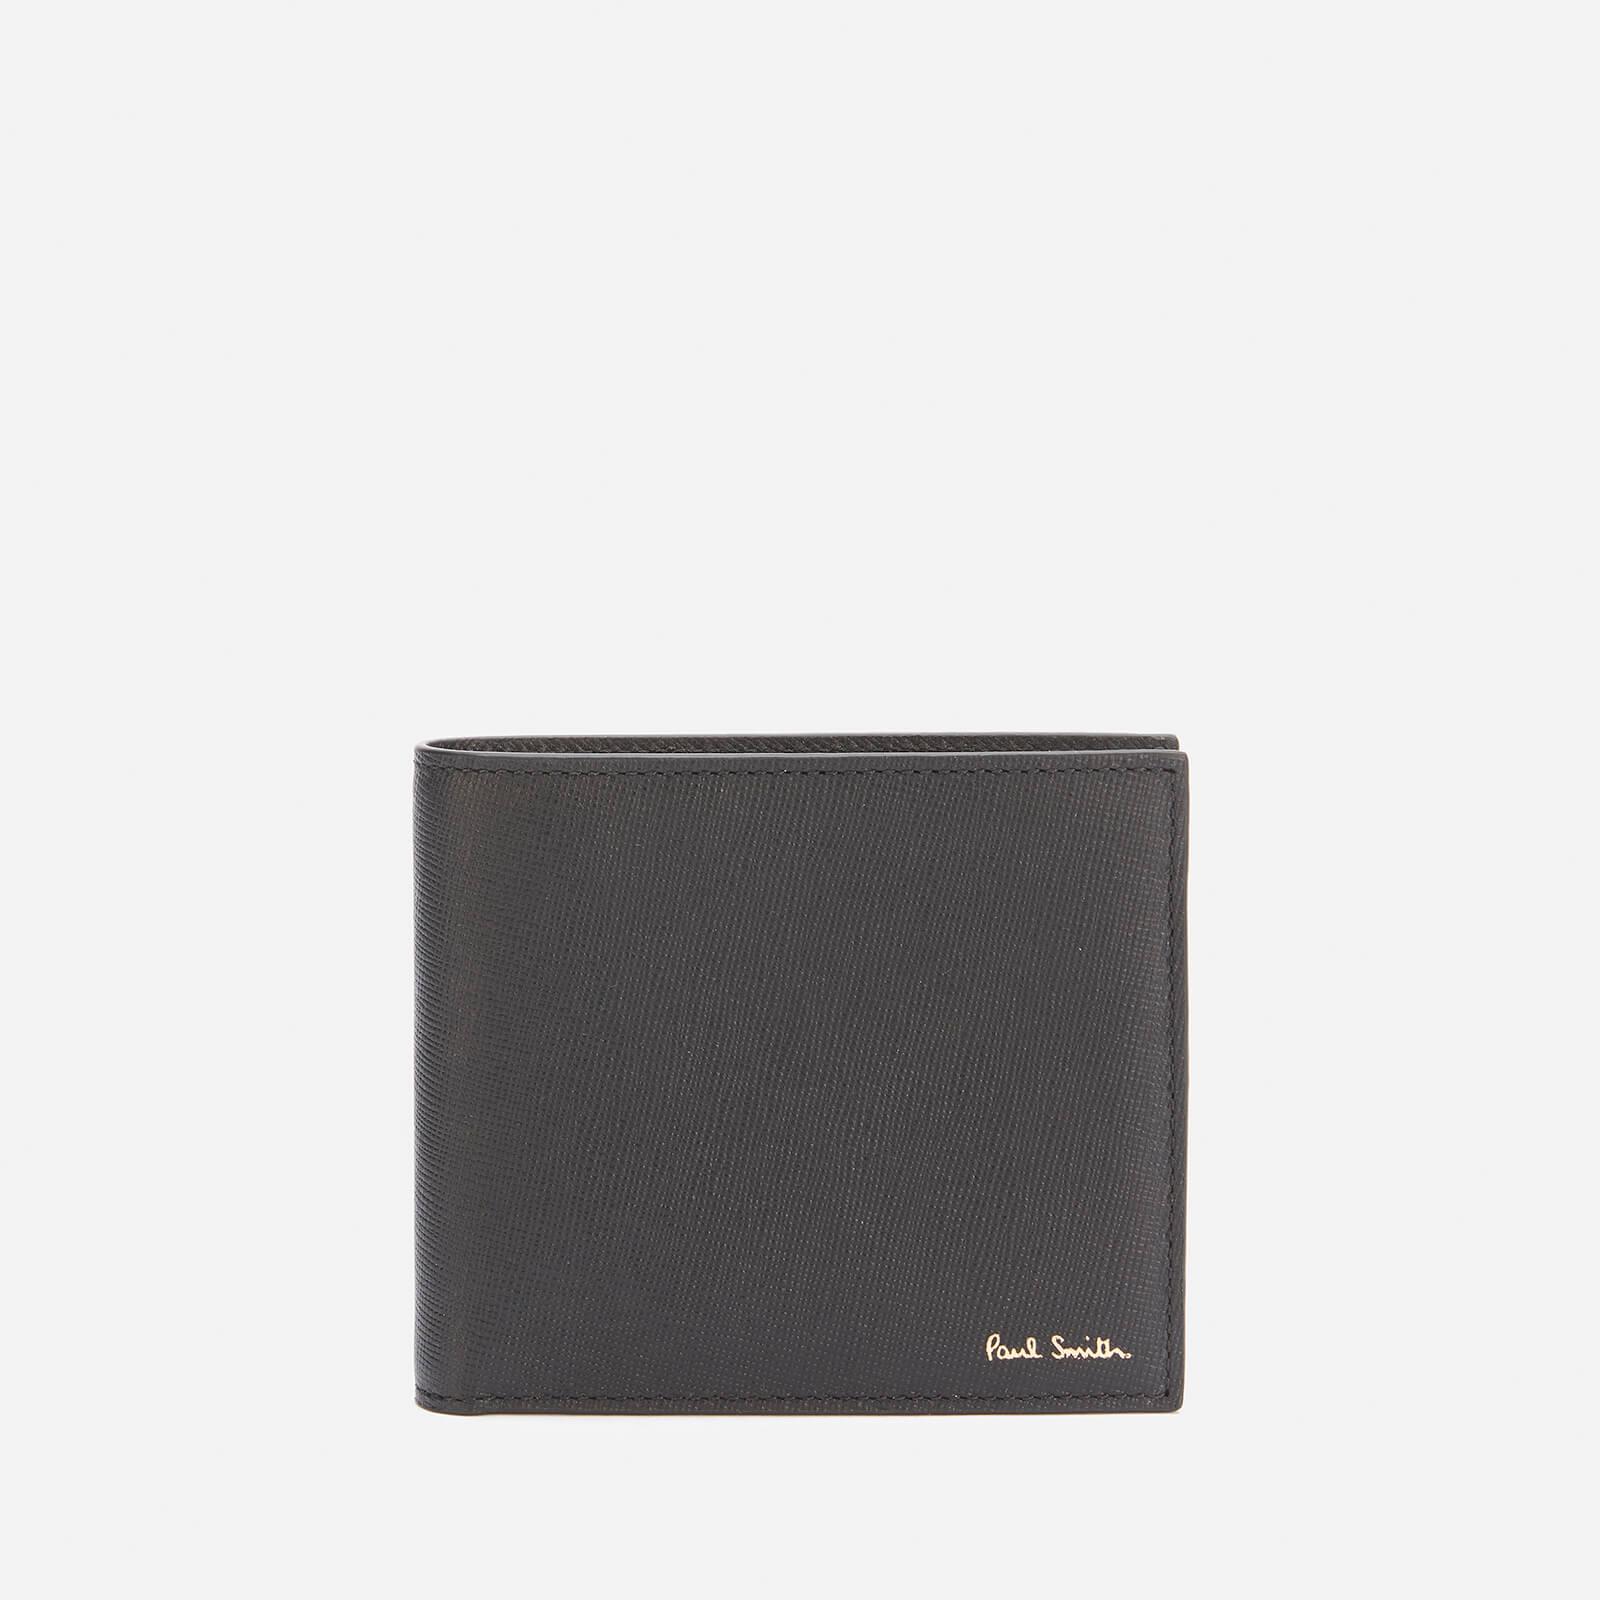 PS Paul Smith Men's Mini Printed Billfold Wallet - Black